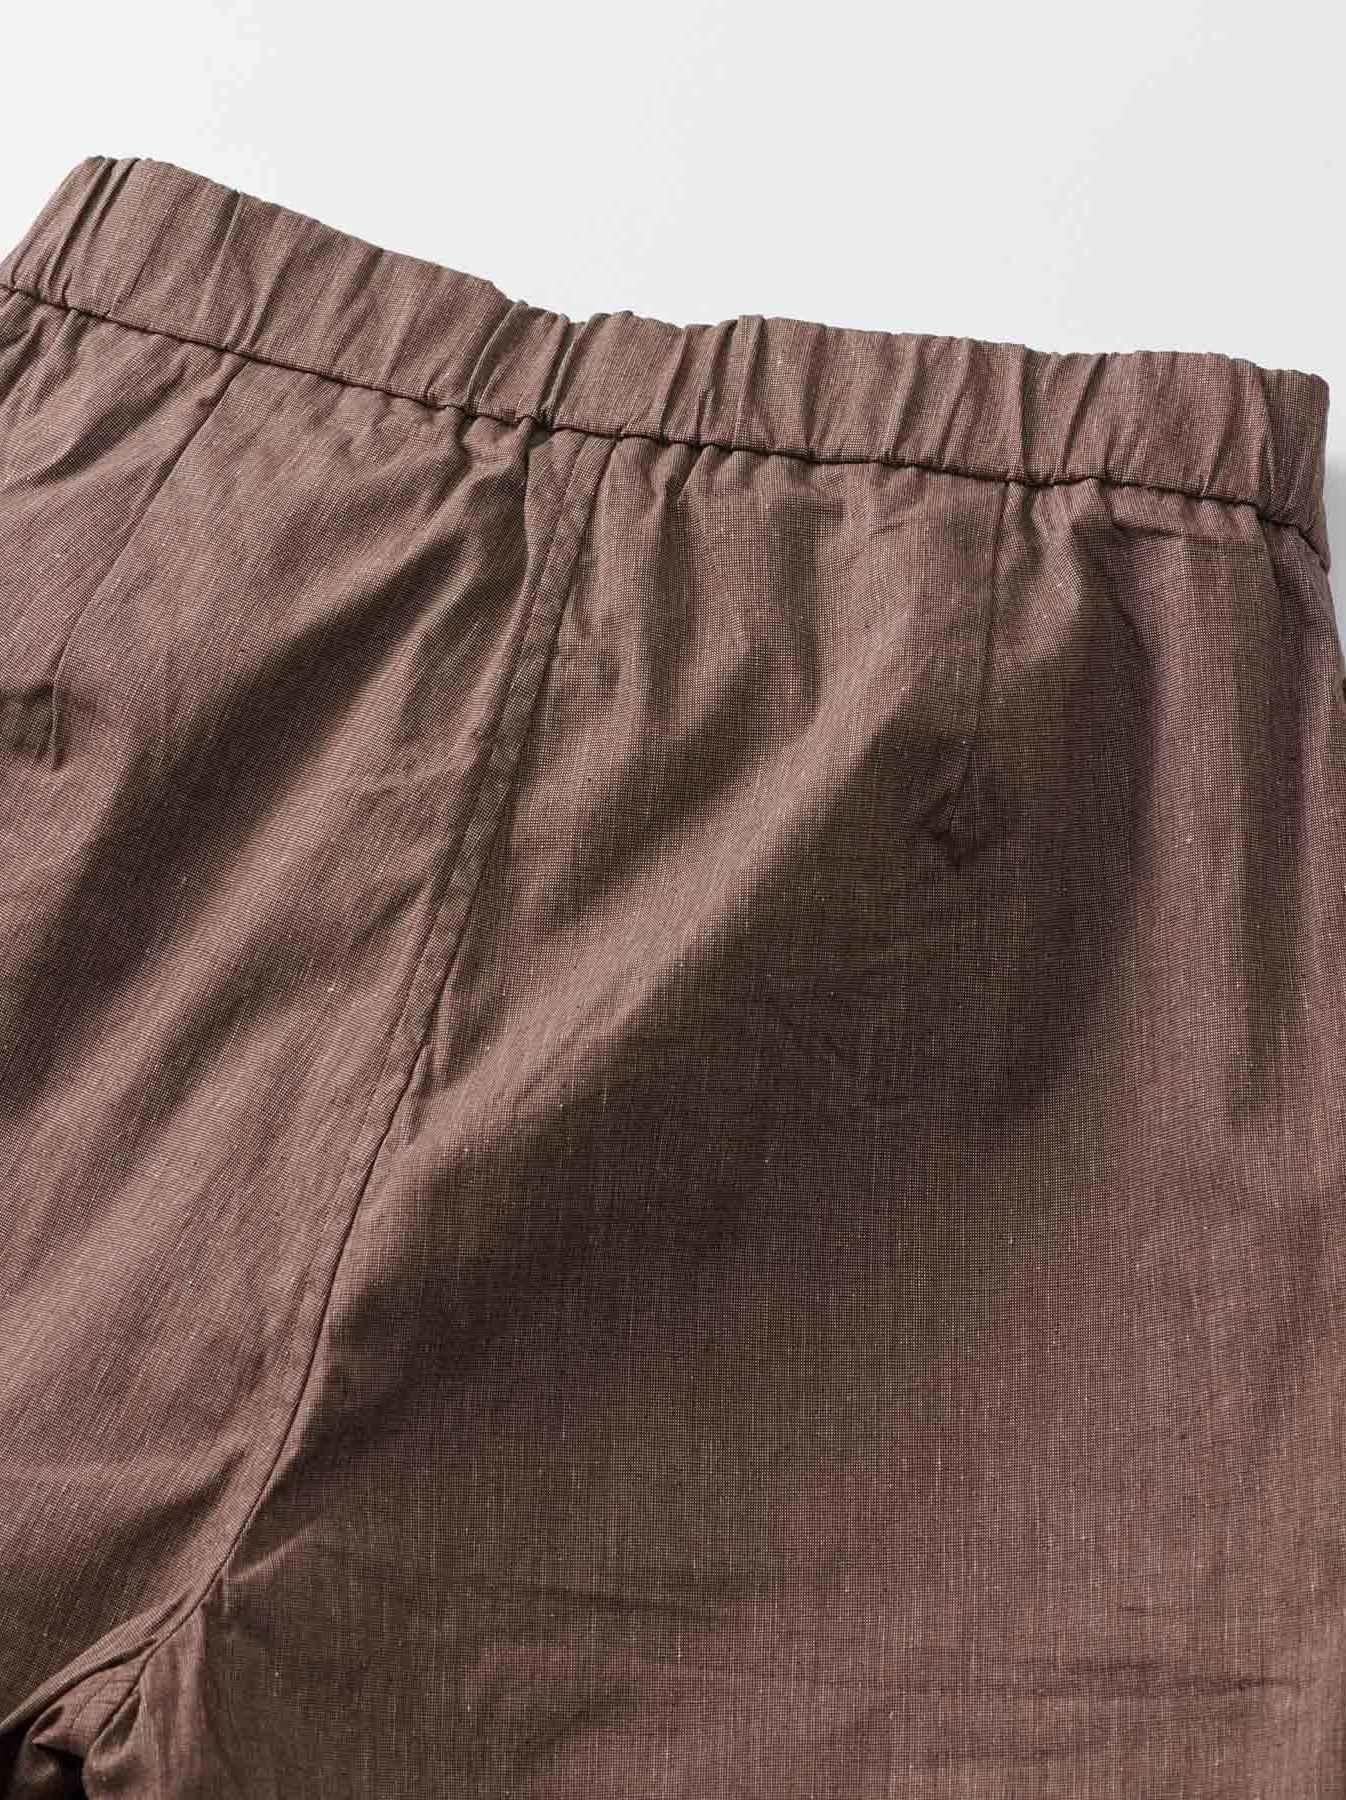 WH Cotton Linen Hakeme Stretch Pants-9